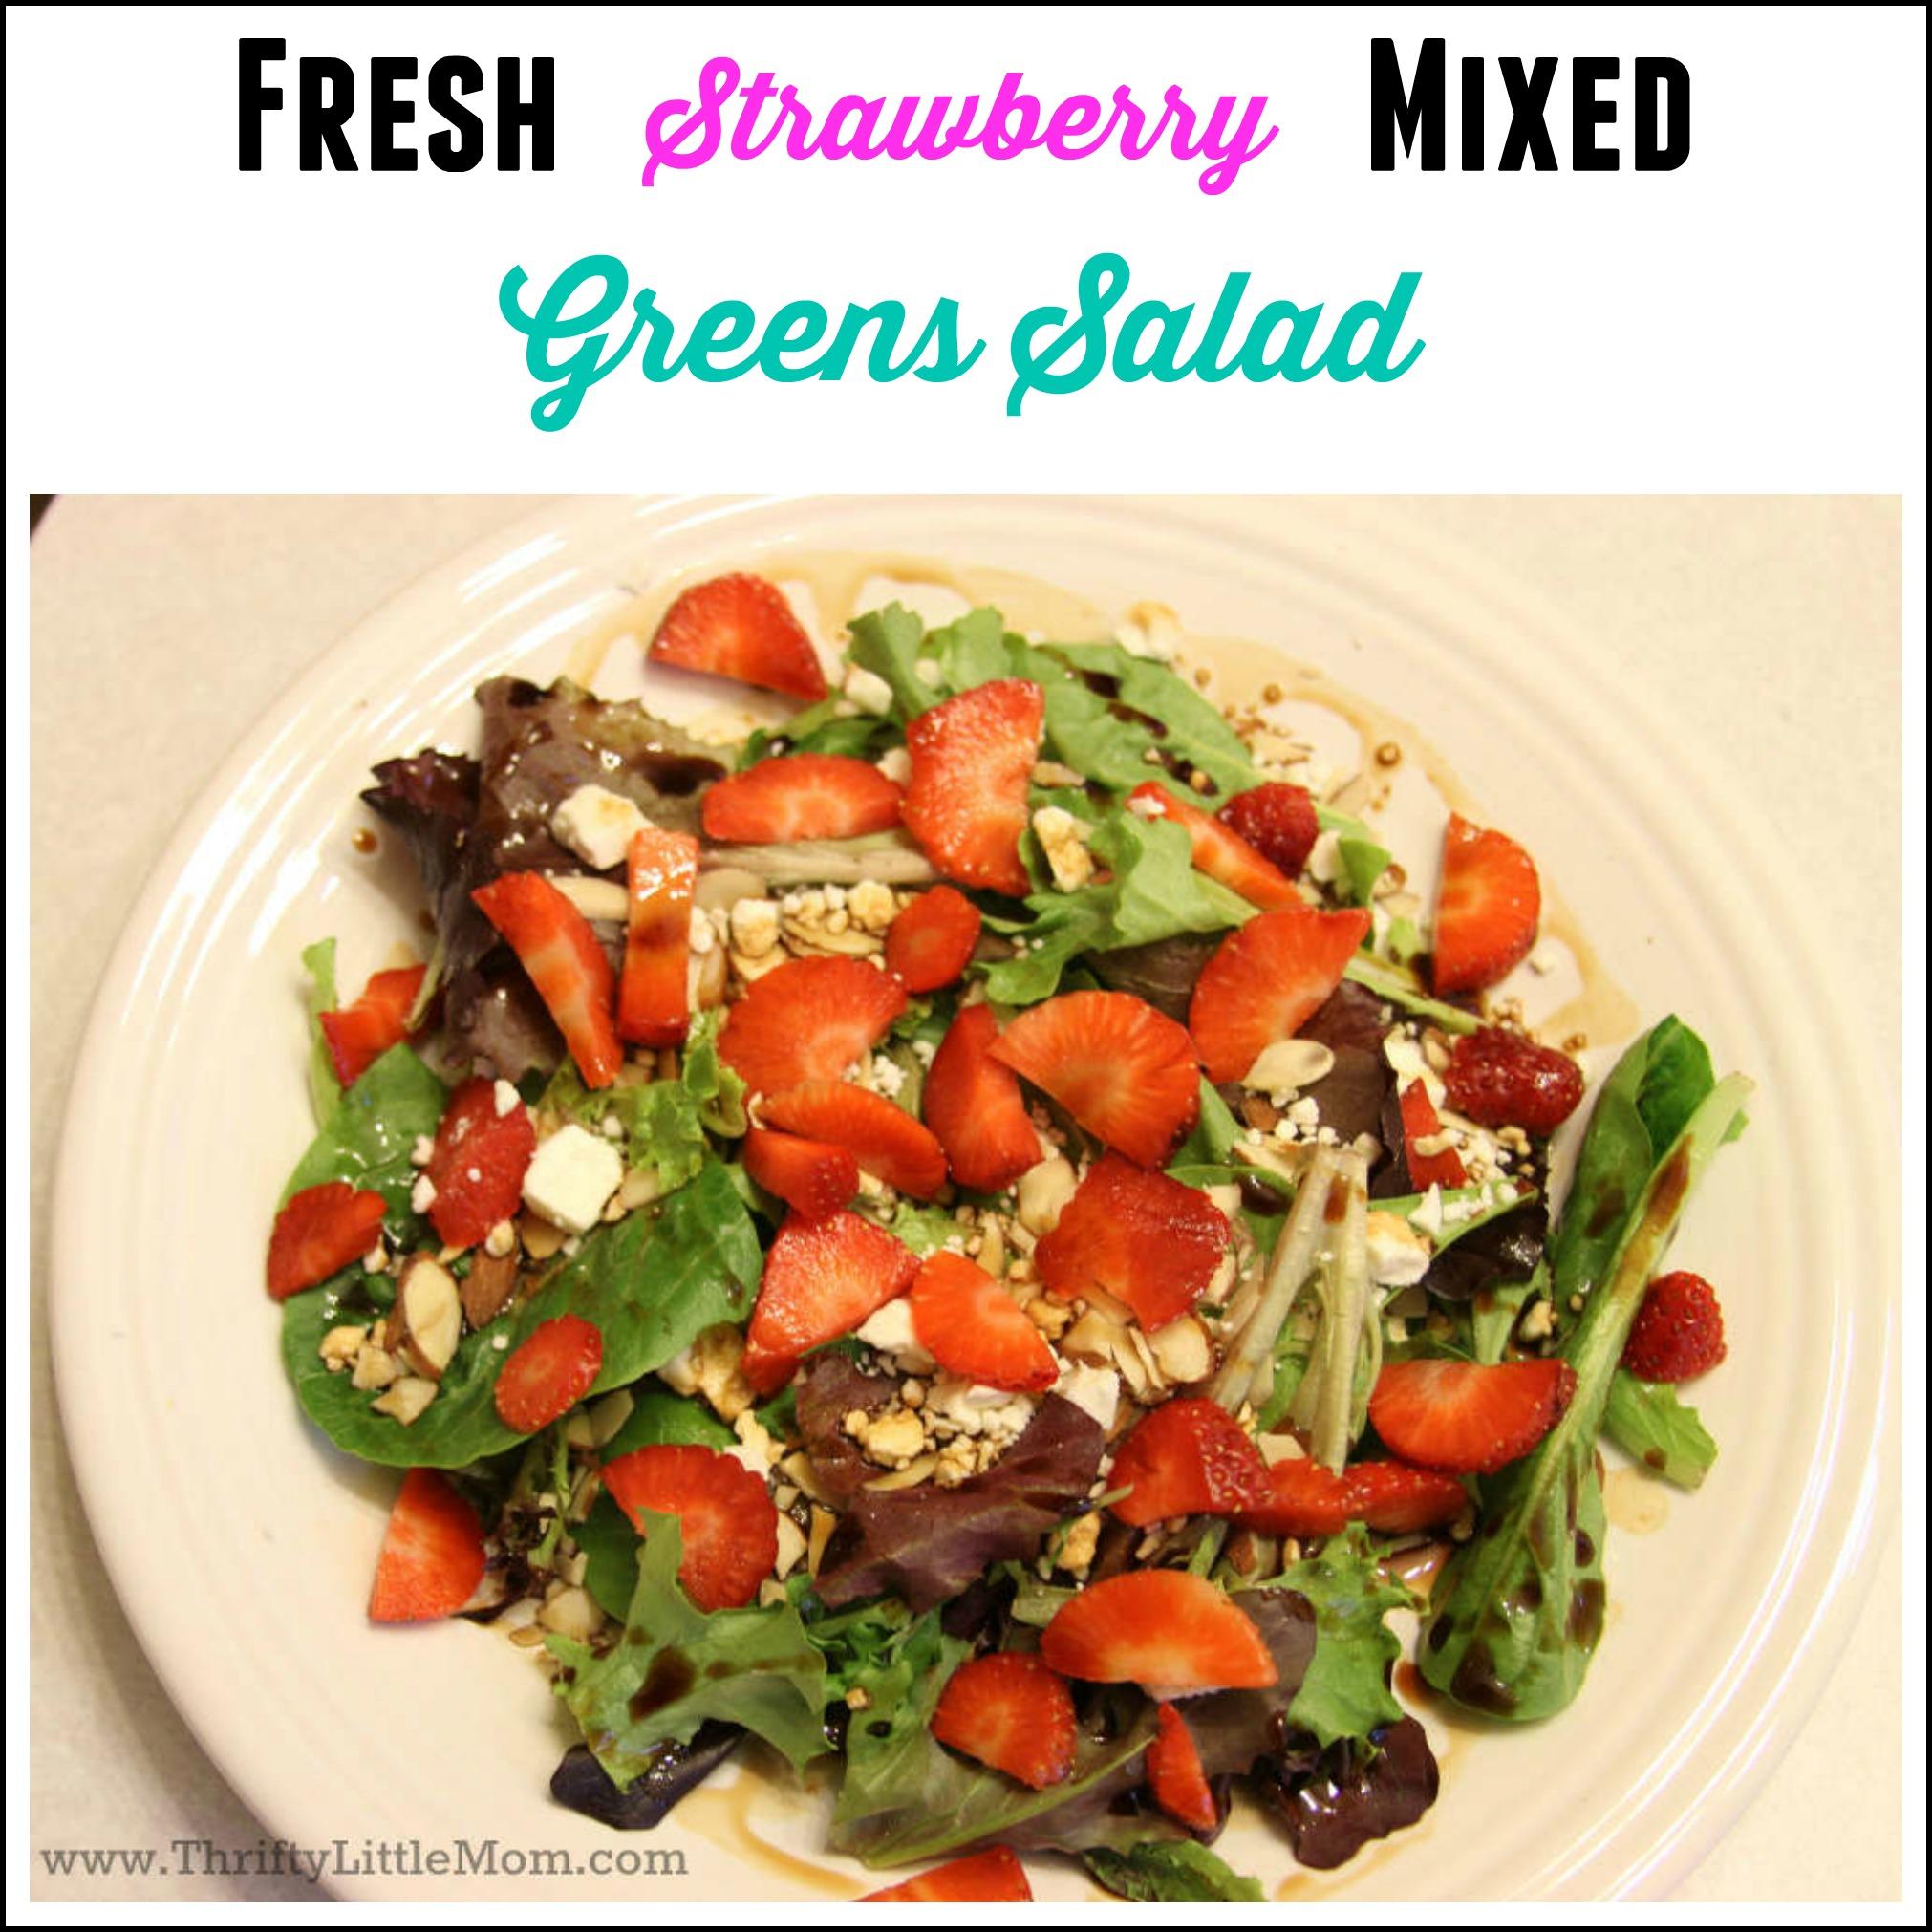 Strawberry Feta Mixed Greens Salad